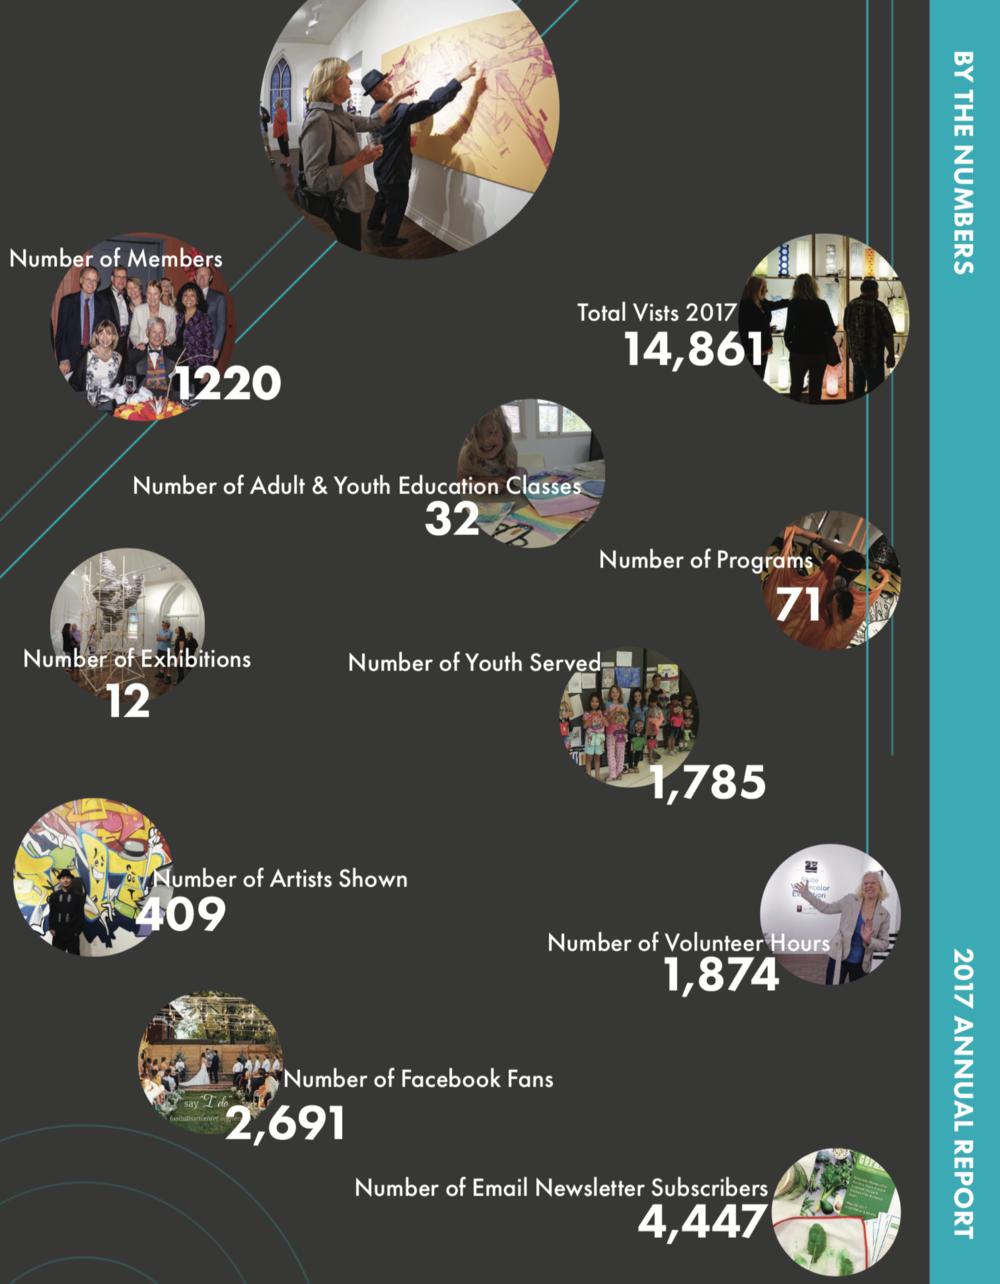 Foothills Art Center 2017 Annual Report